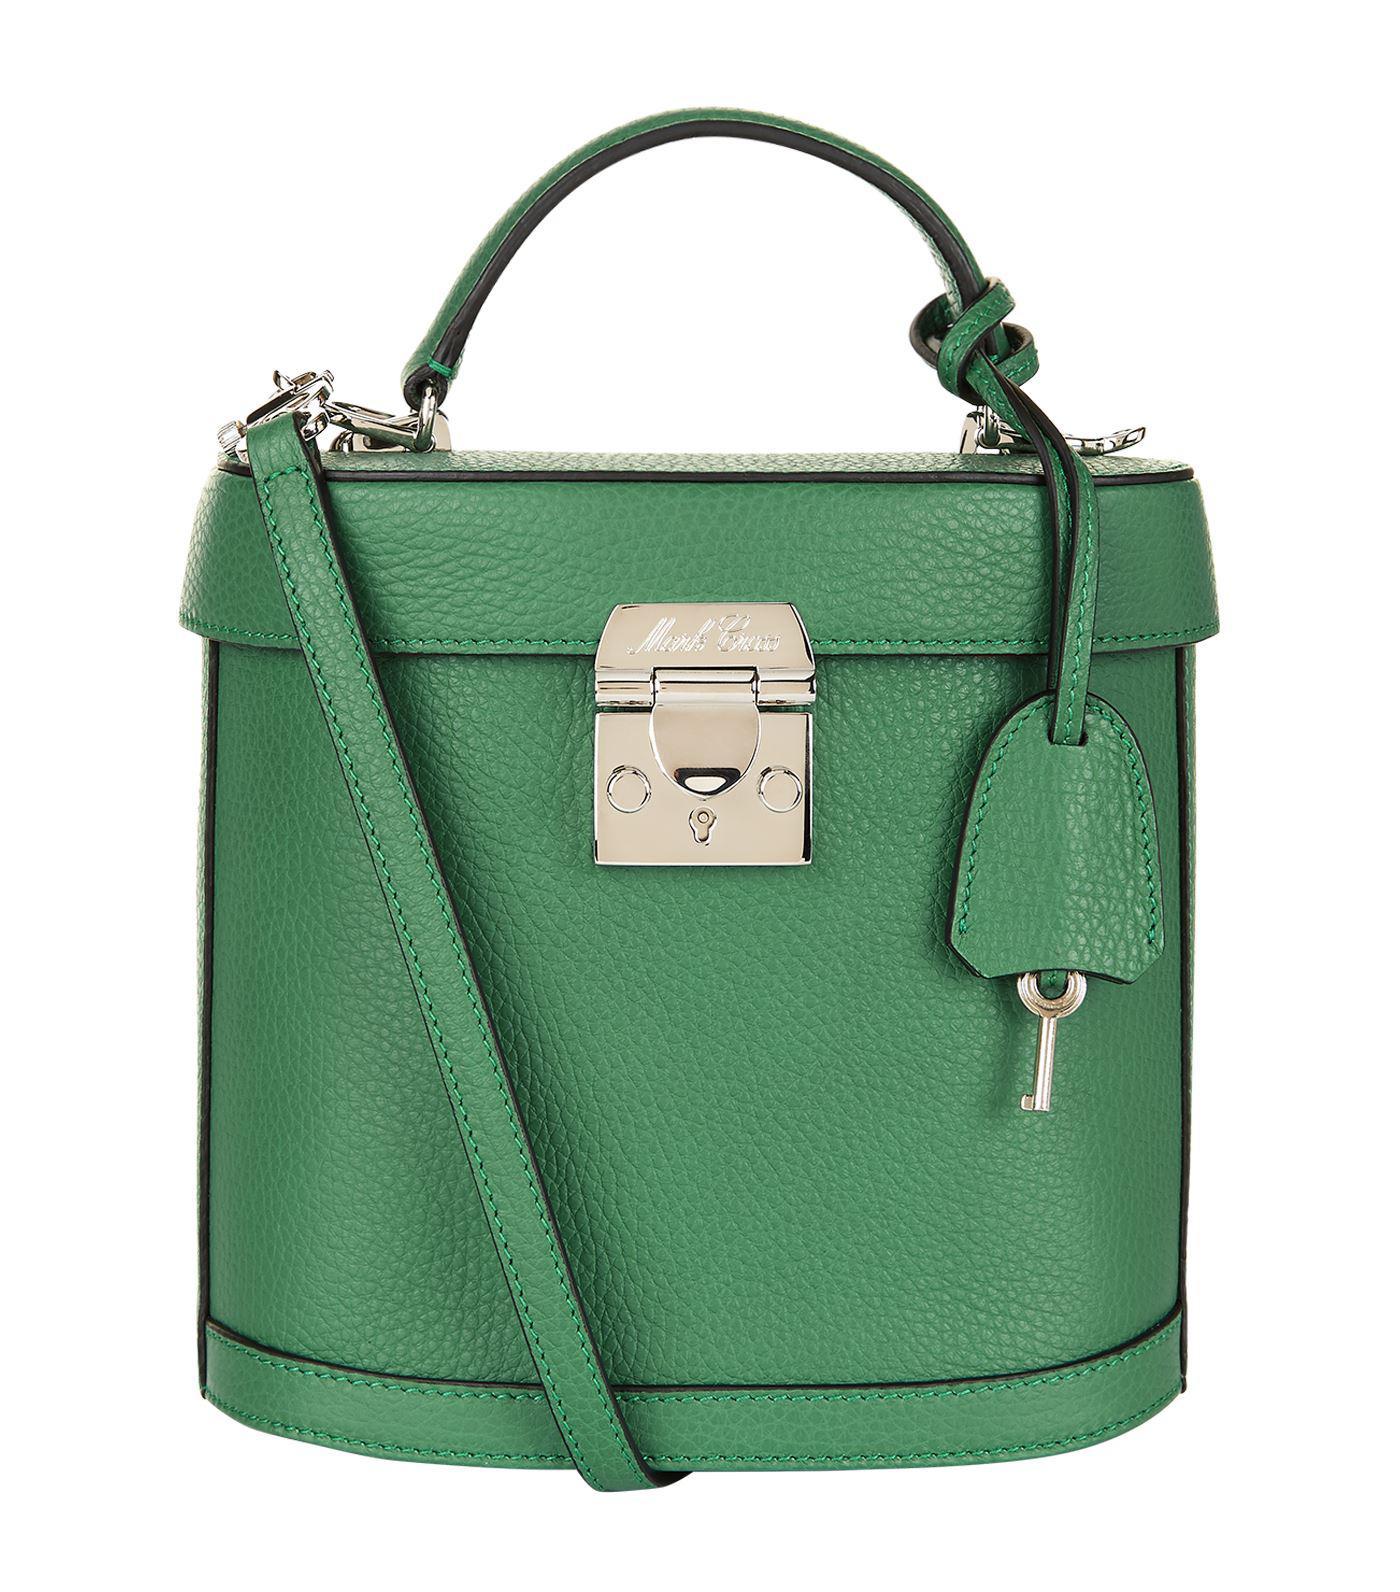 Benchley grained-leather shoulder bag Mark Cross ATslf